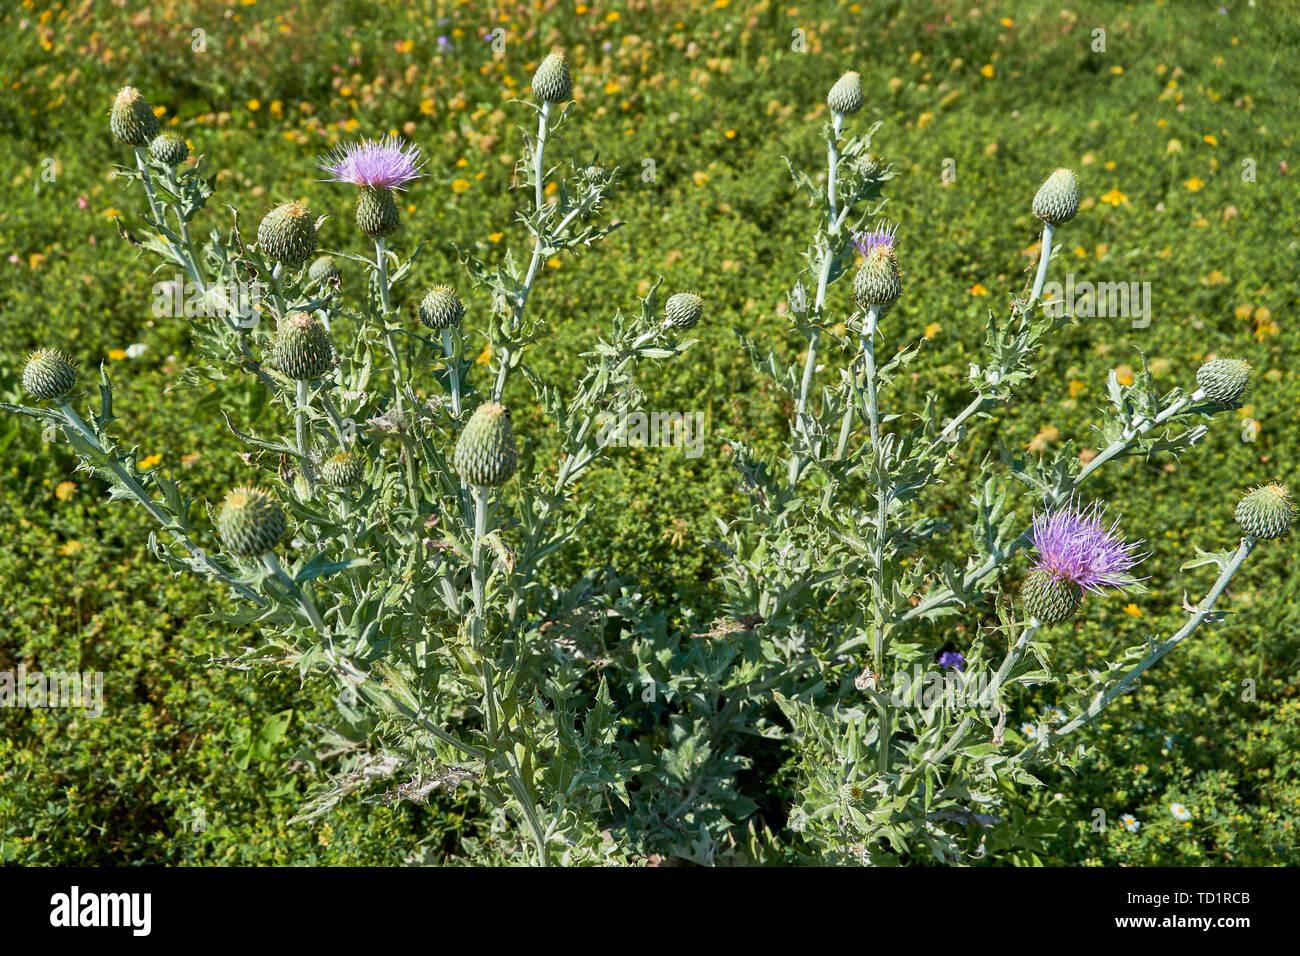 texas-thistle-plant-with-blooms-cirsium-texanum